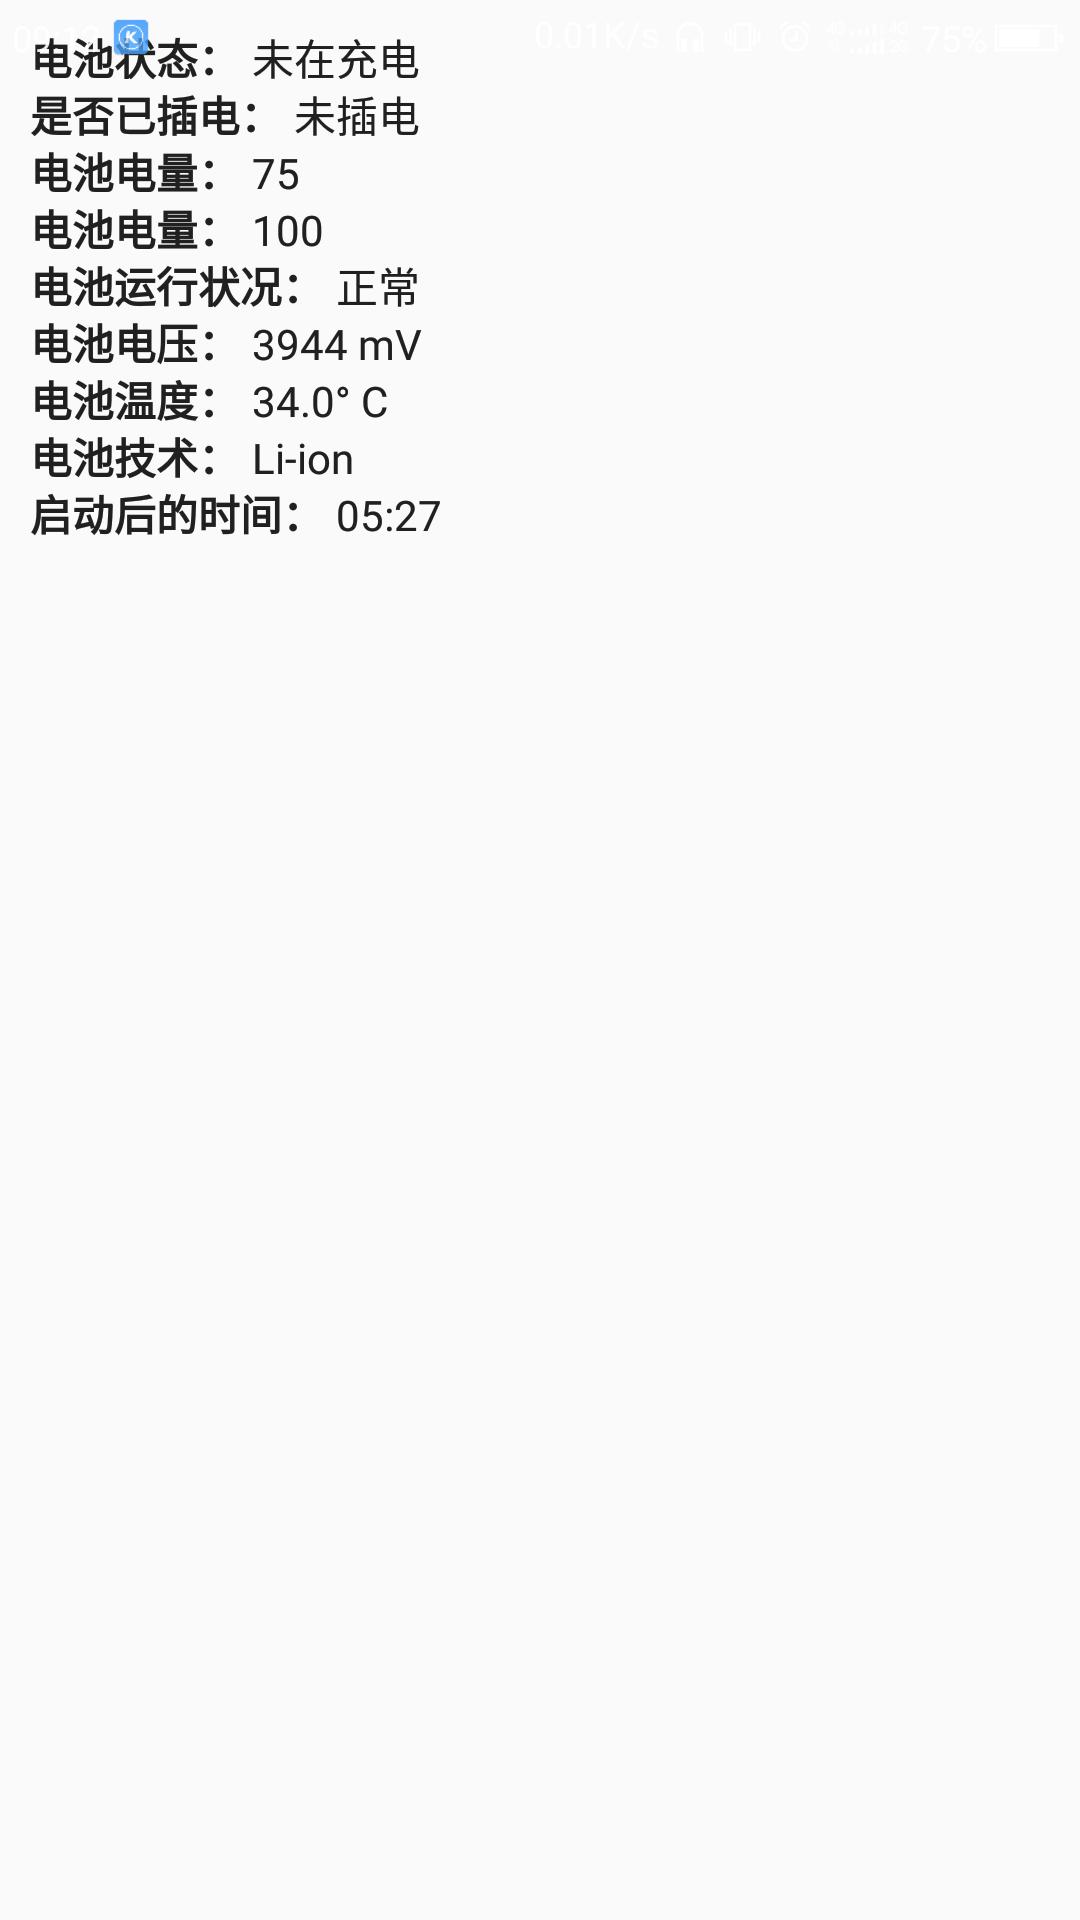 Screenshot_2016-08-27-09-12-58.png